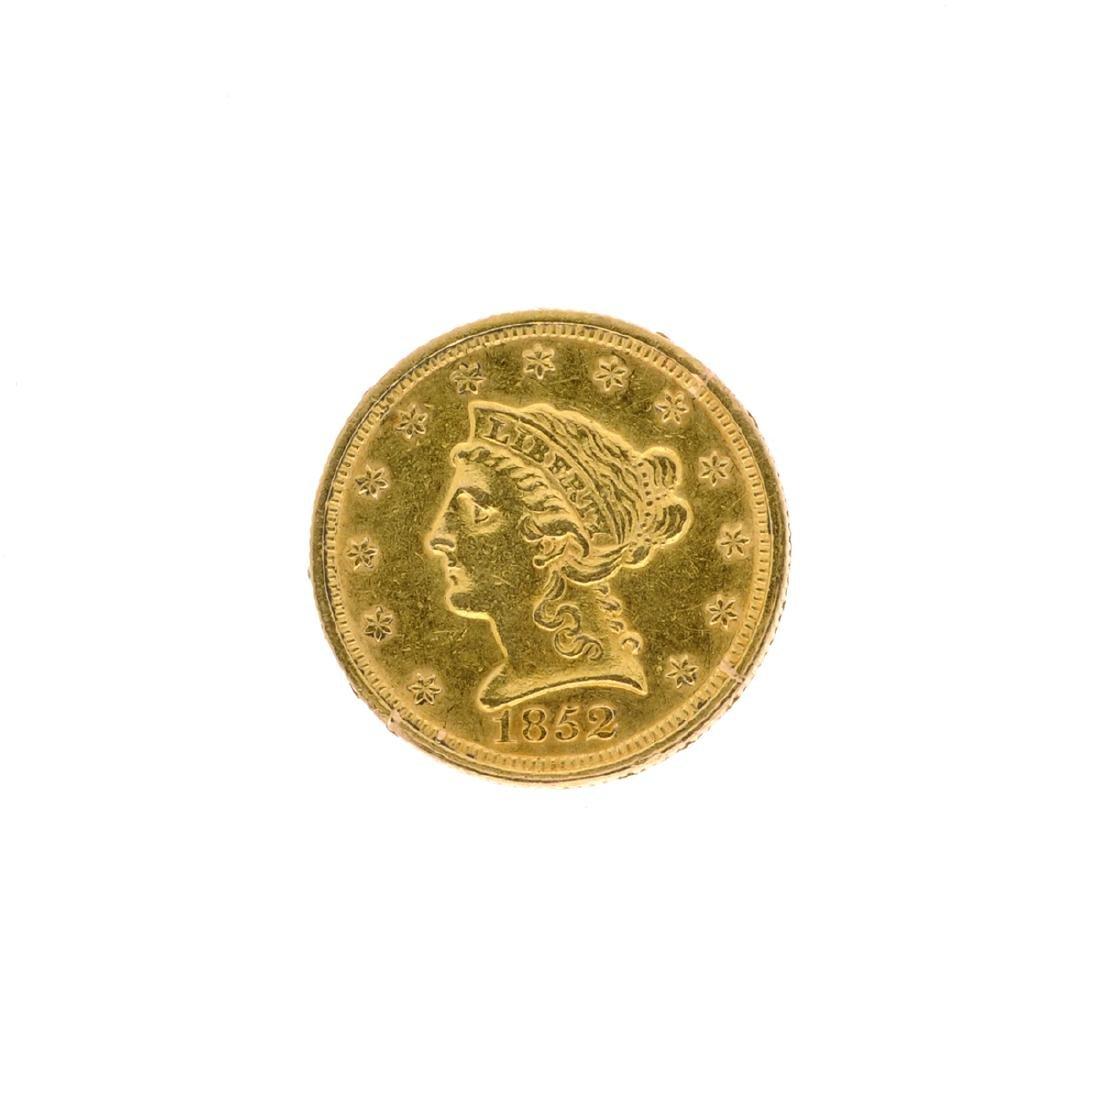 1852 $2.50 U.S. Liberty Head Gold Coin